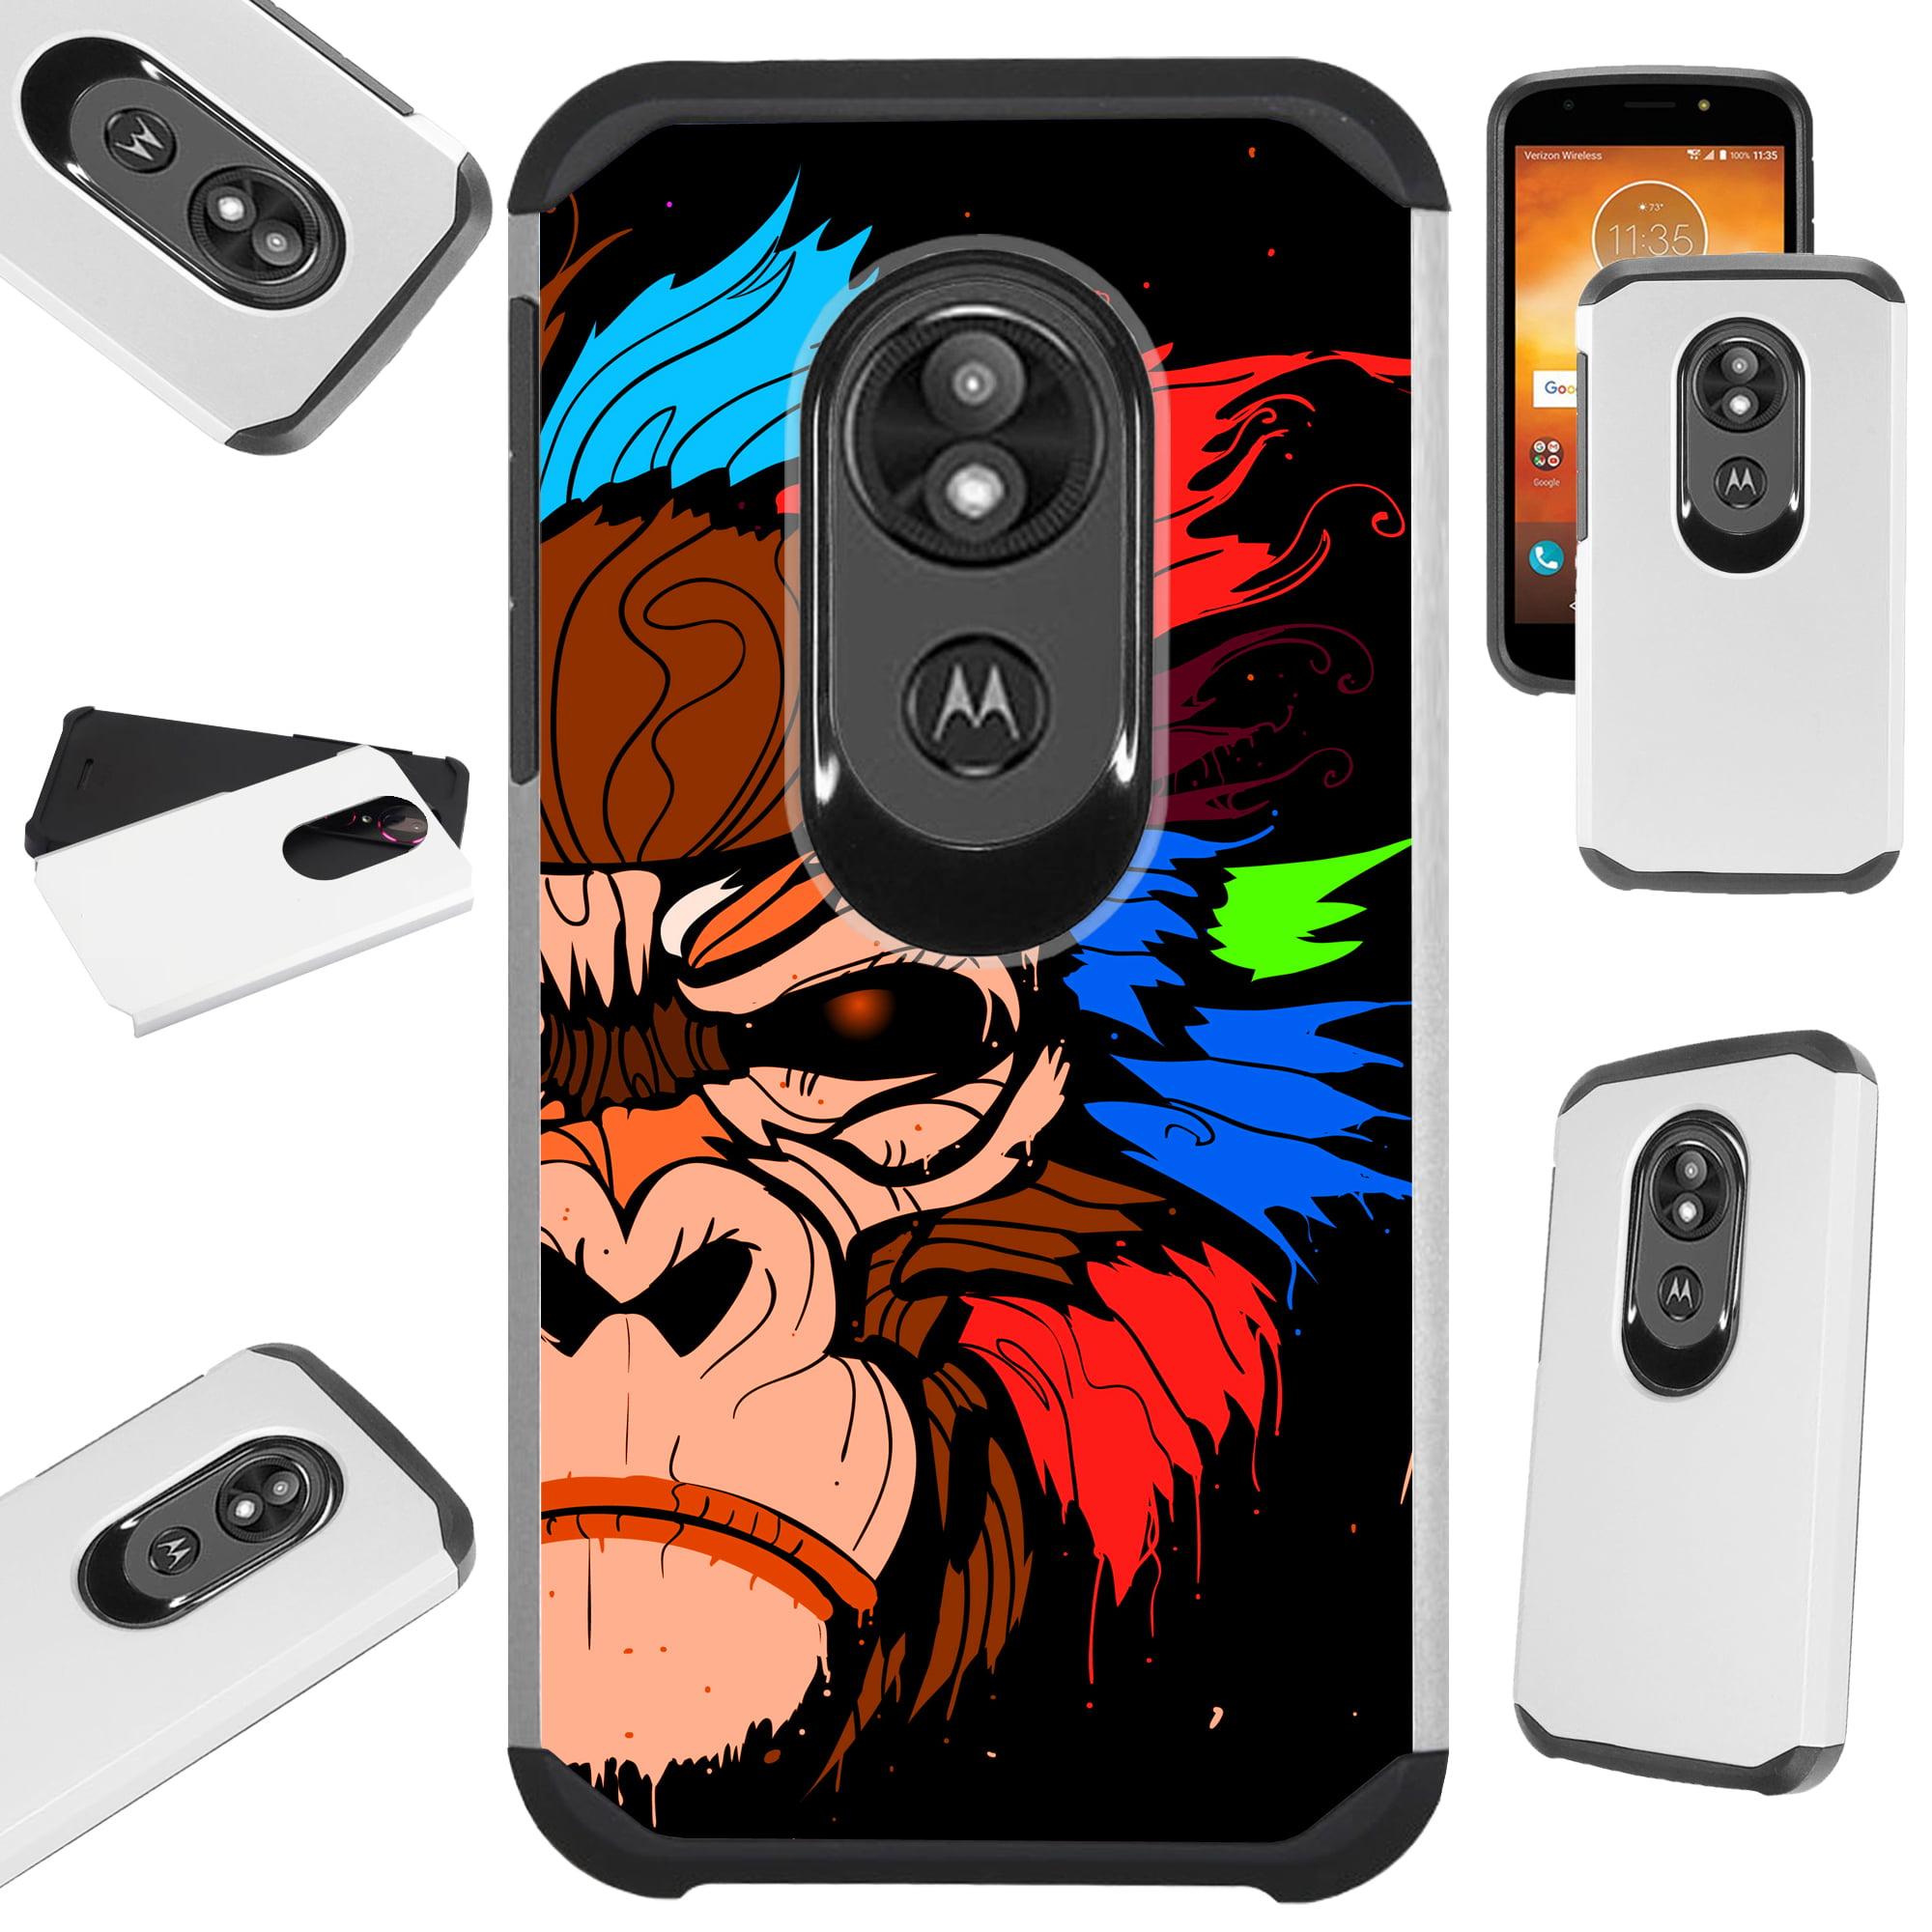 For Motorola Moto E5 Play | Moto E5 Cruise Case Hybrid TPU Fusion Phone Cover (Gorilla Brown)